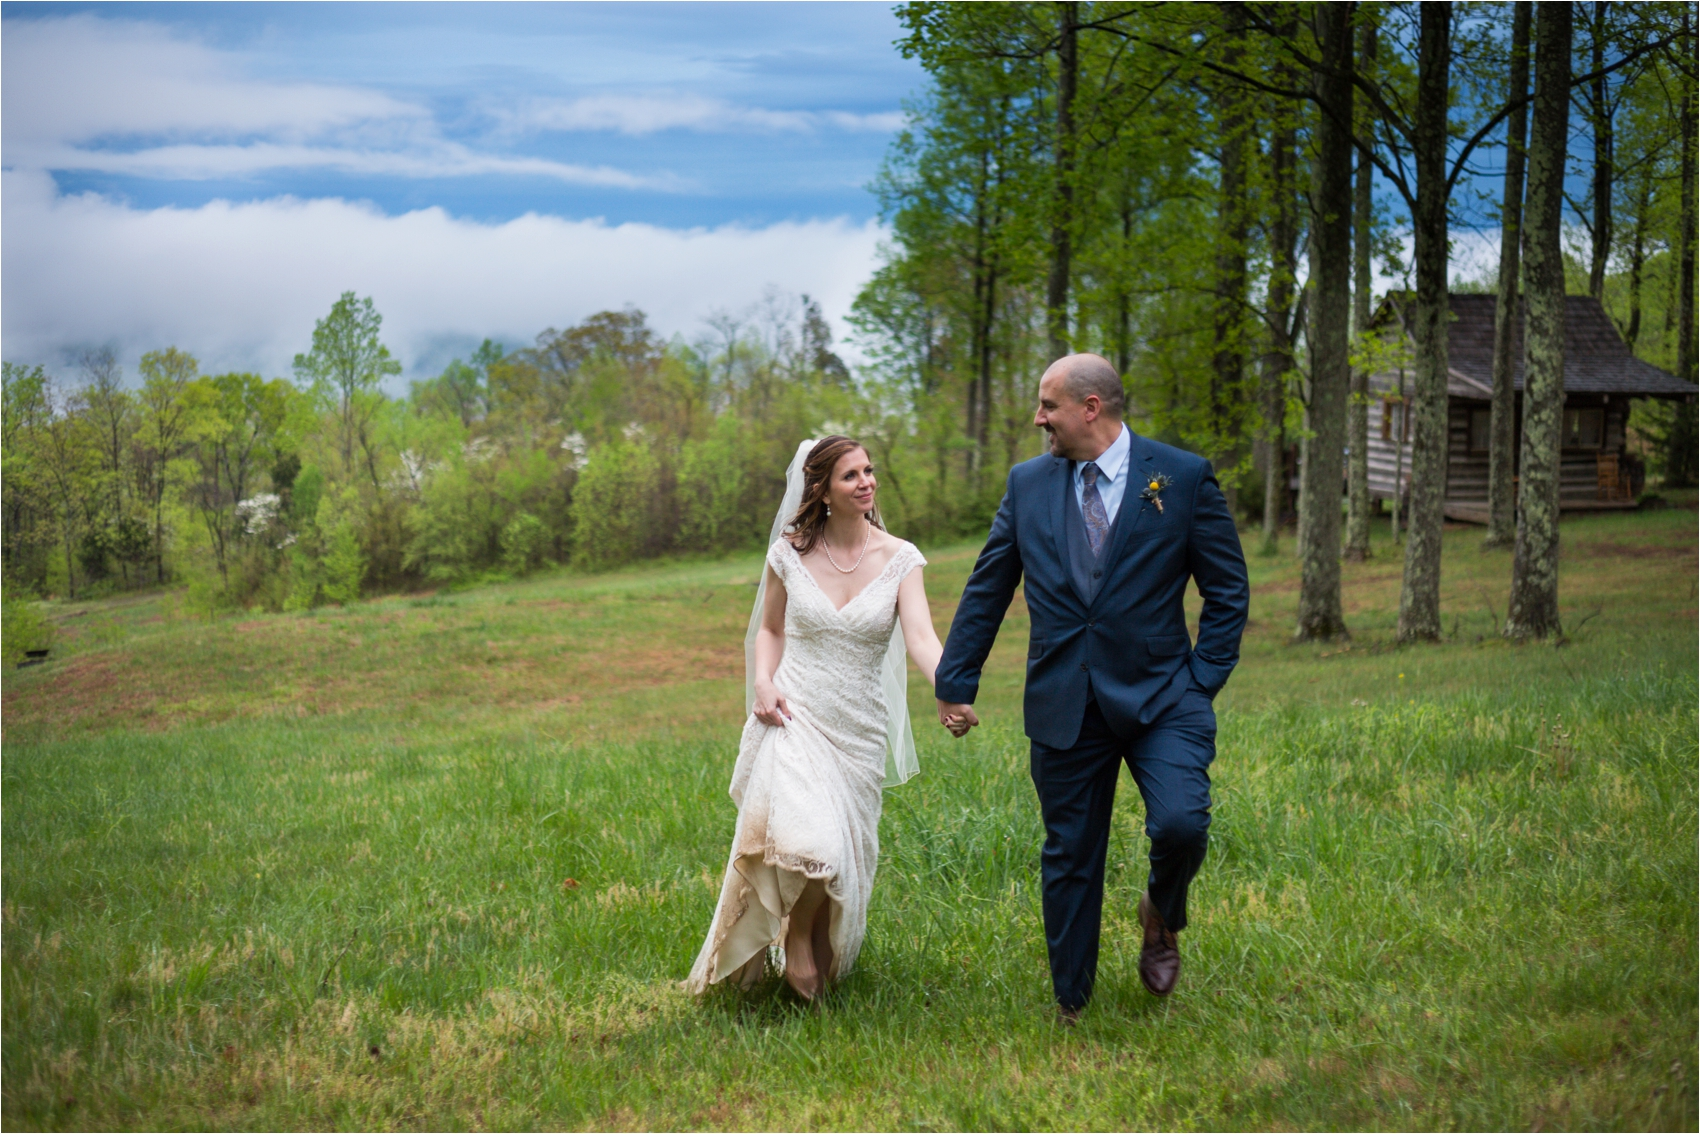 Lydia-Mountain-Spring-Virginia-Wedding-1272.jpg